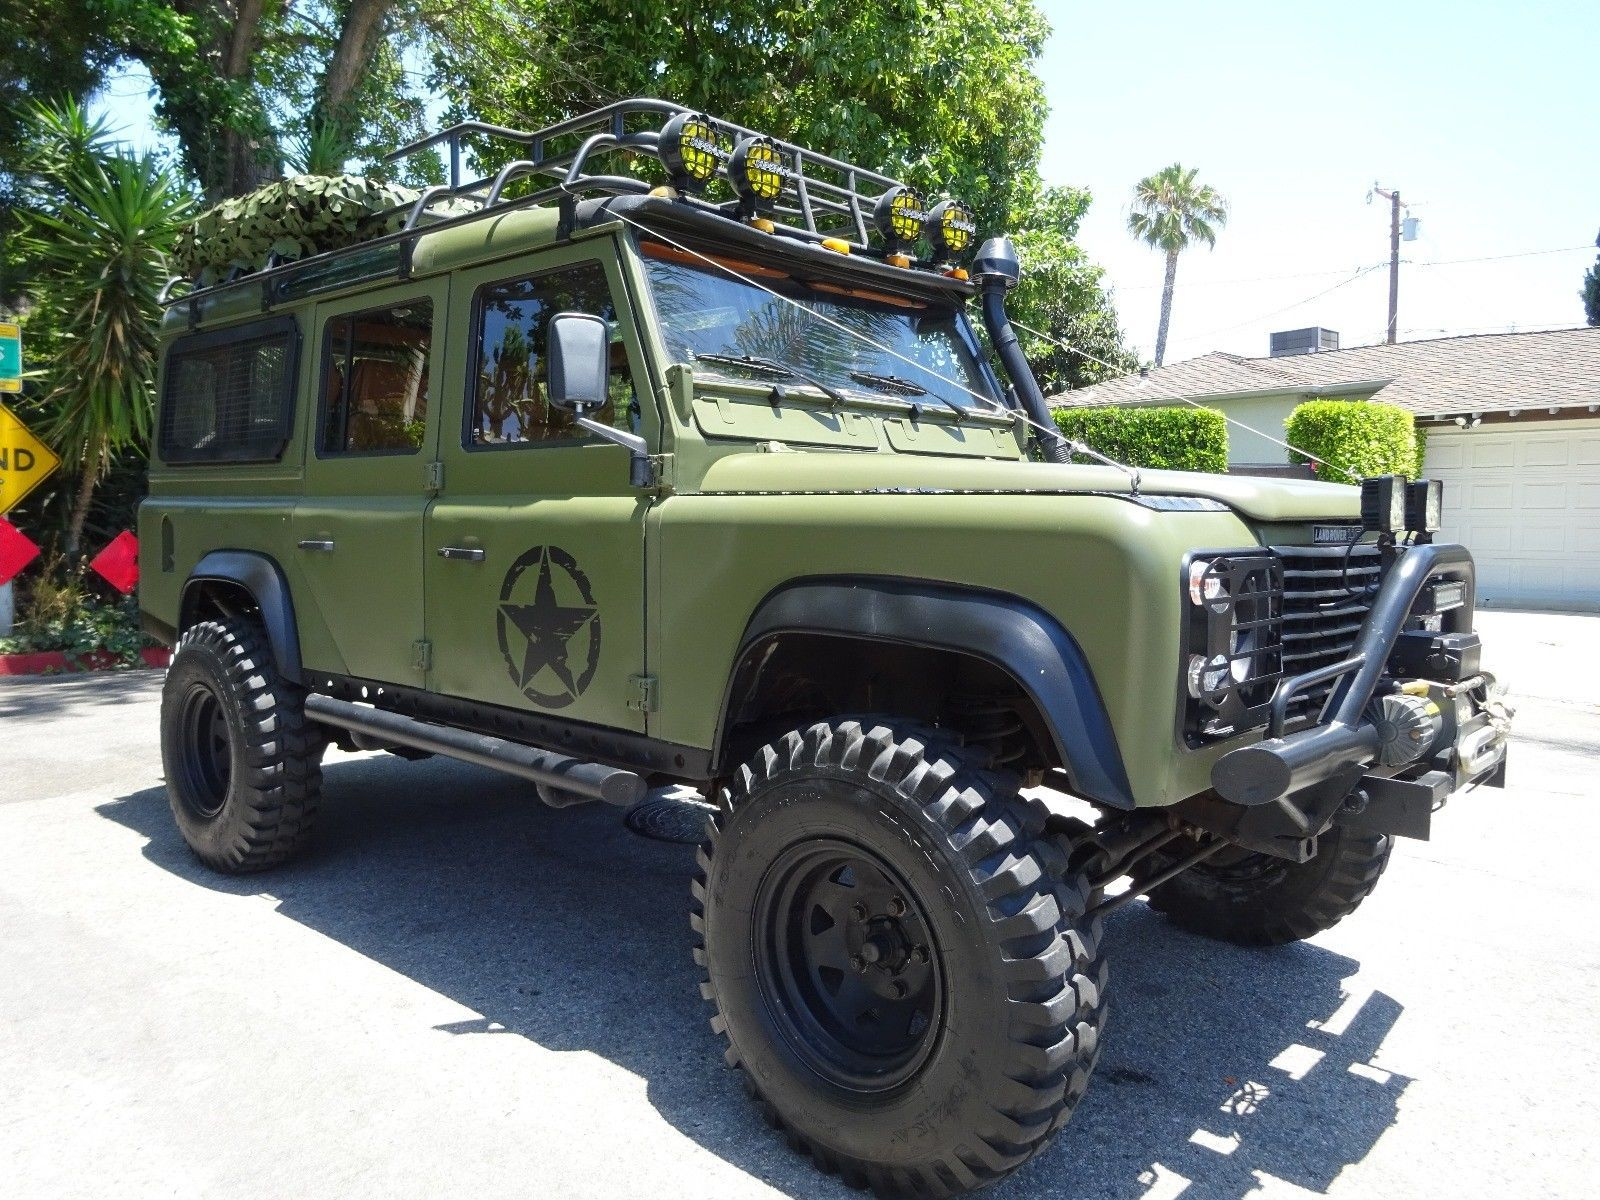 1990 Land Rover Defender 110 Транспорт, Автомобили и